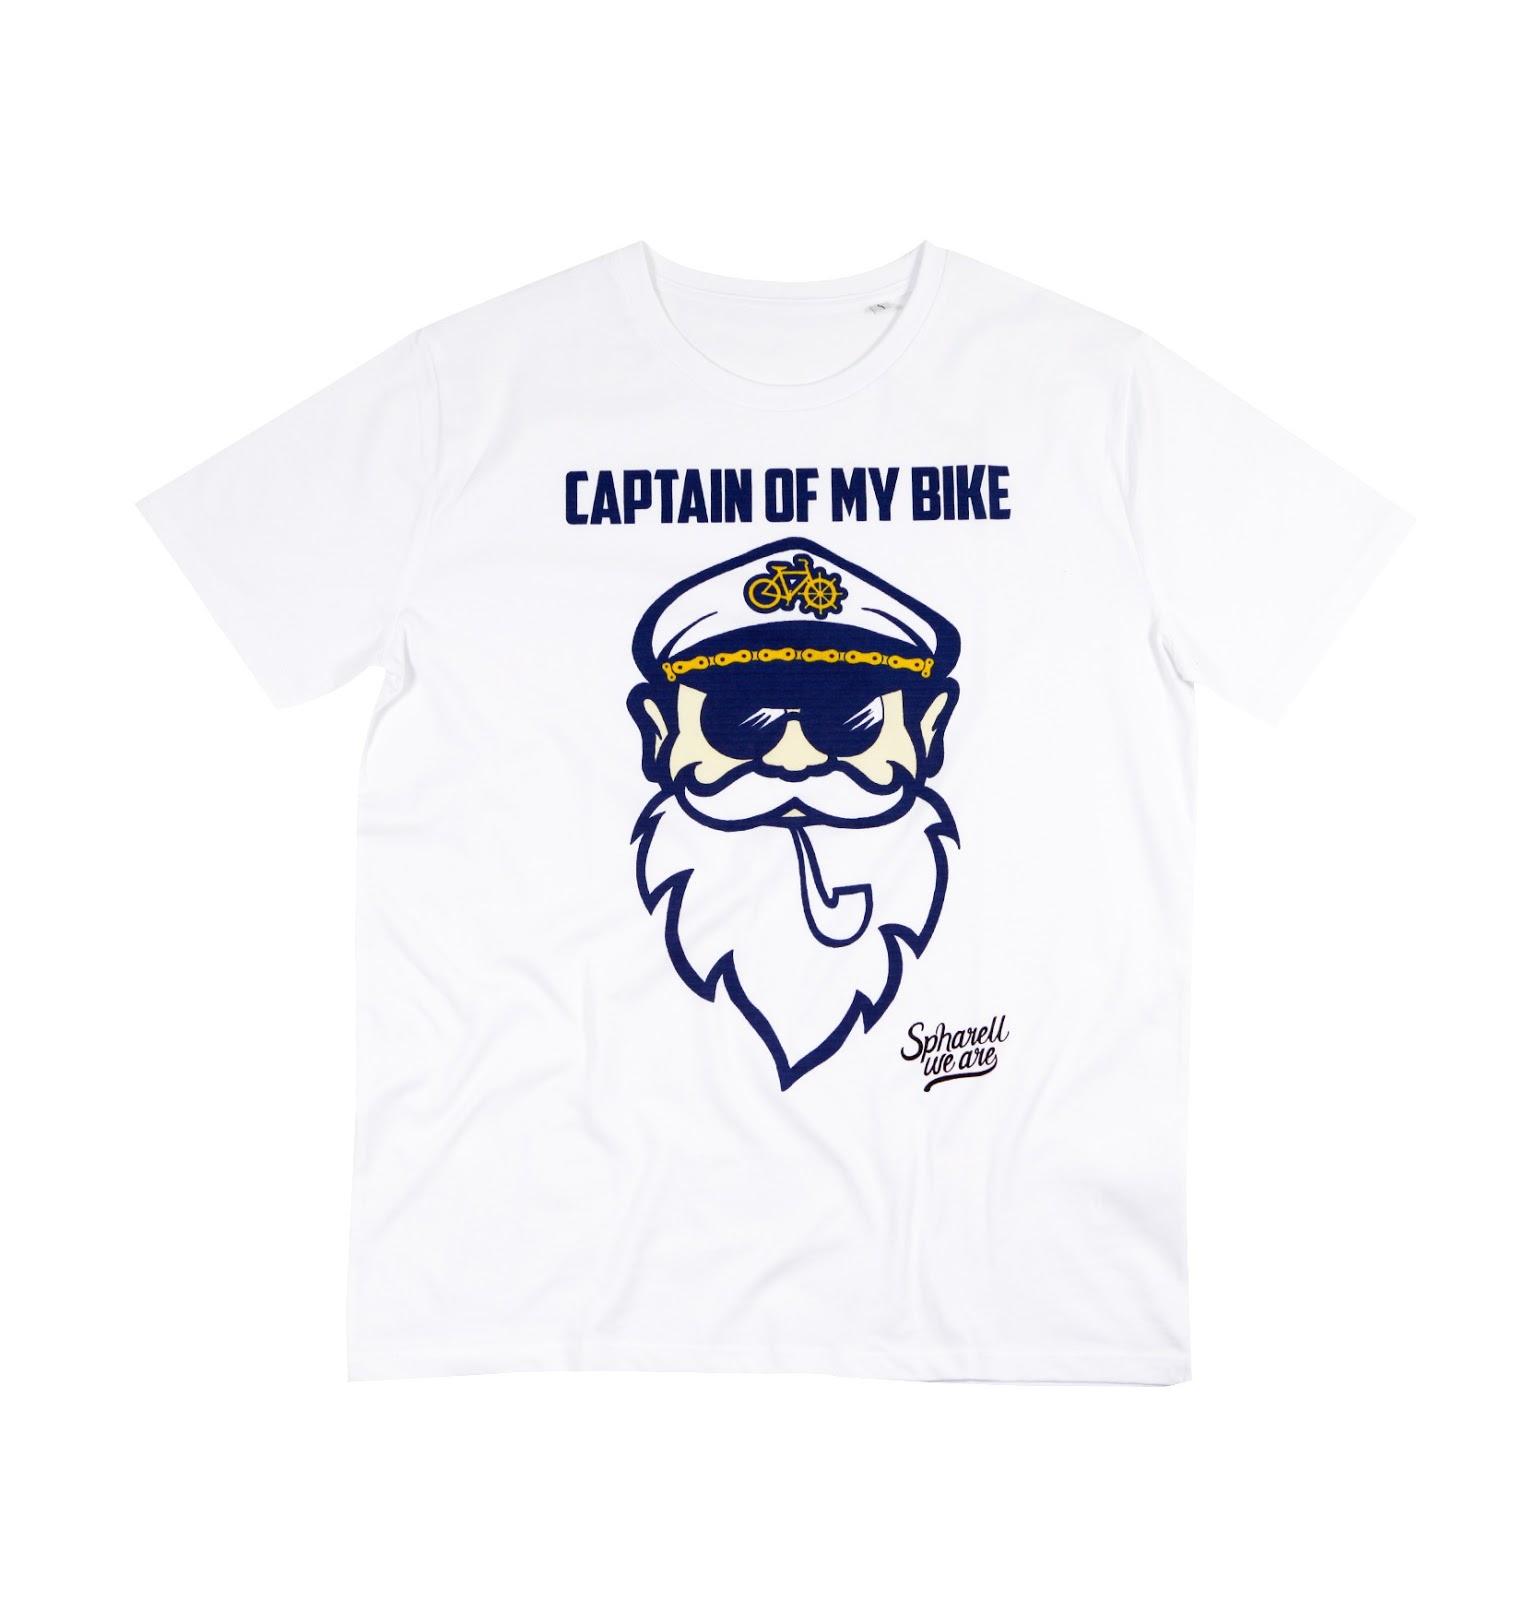 https://grafitee.es/s/camisetas/909-t-shirt-captain-of-my-bike.html